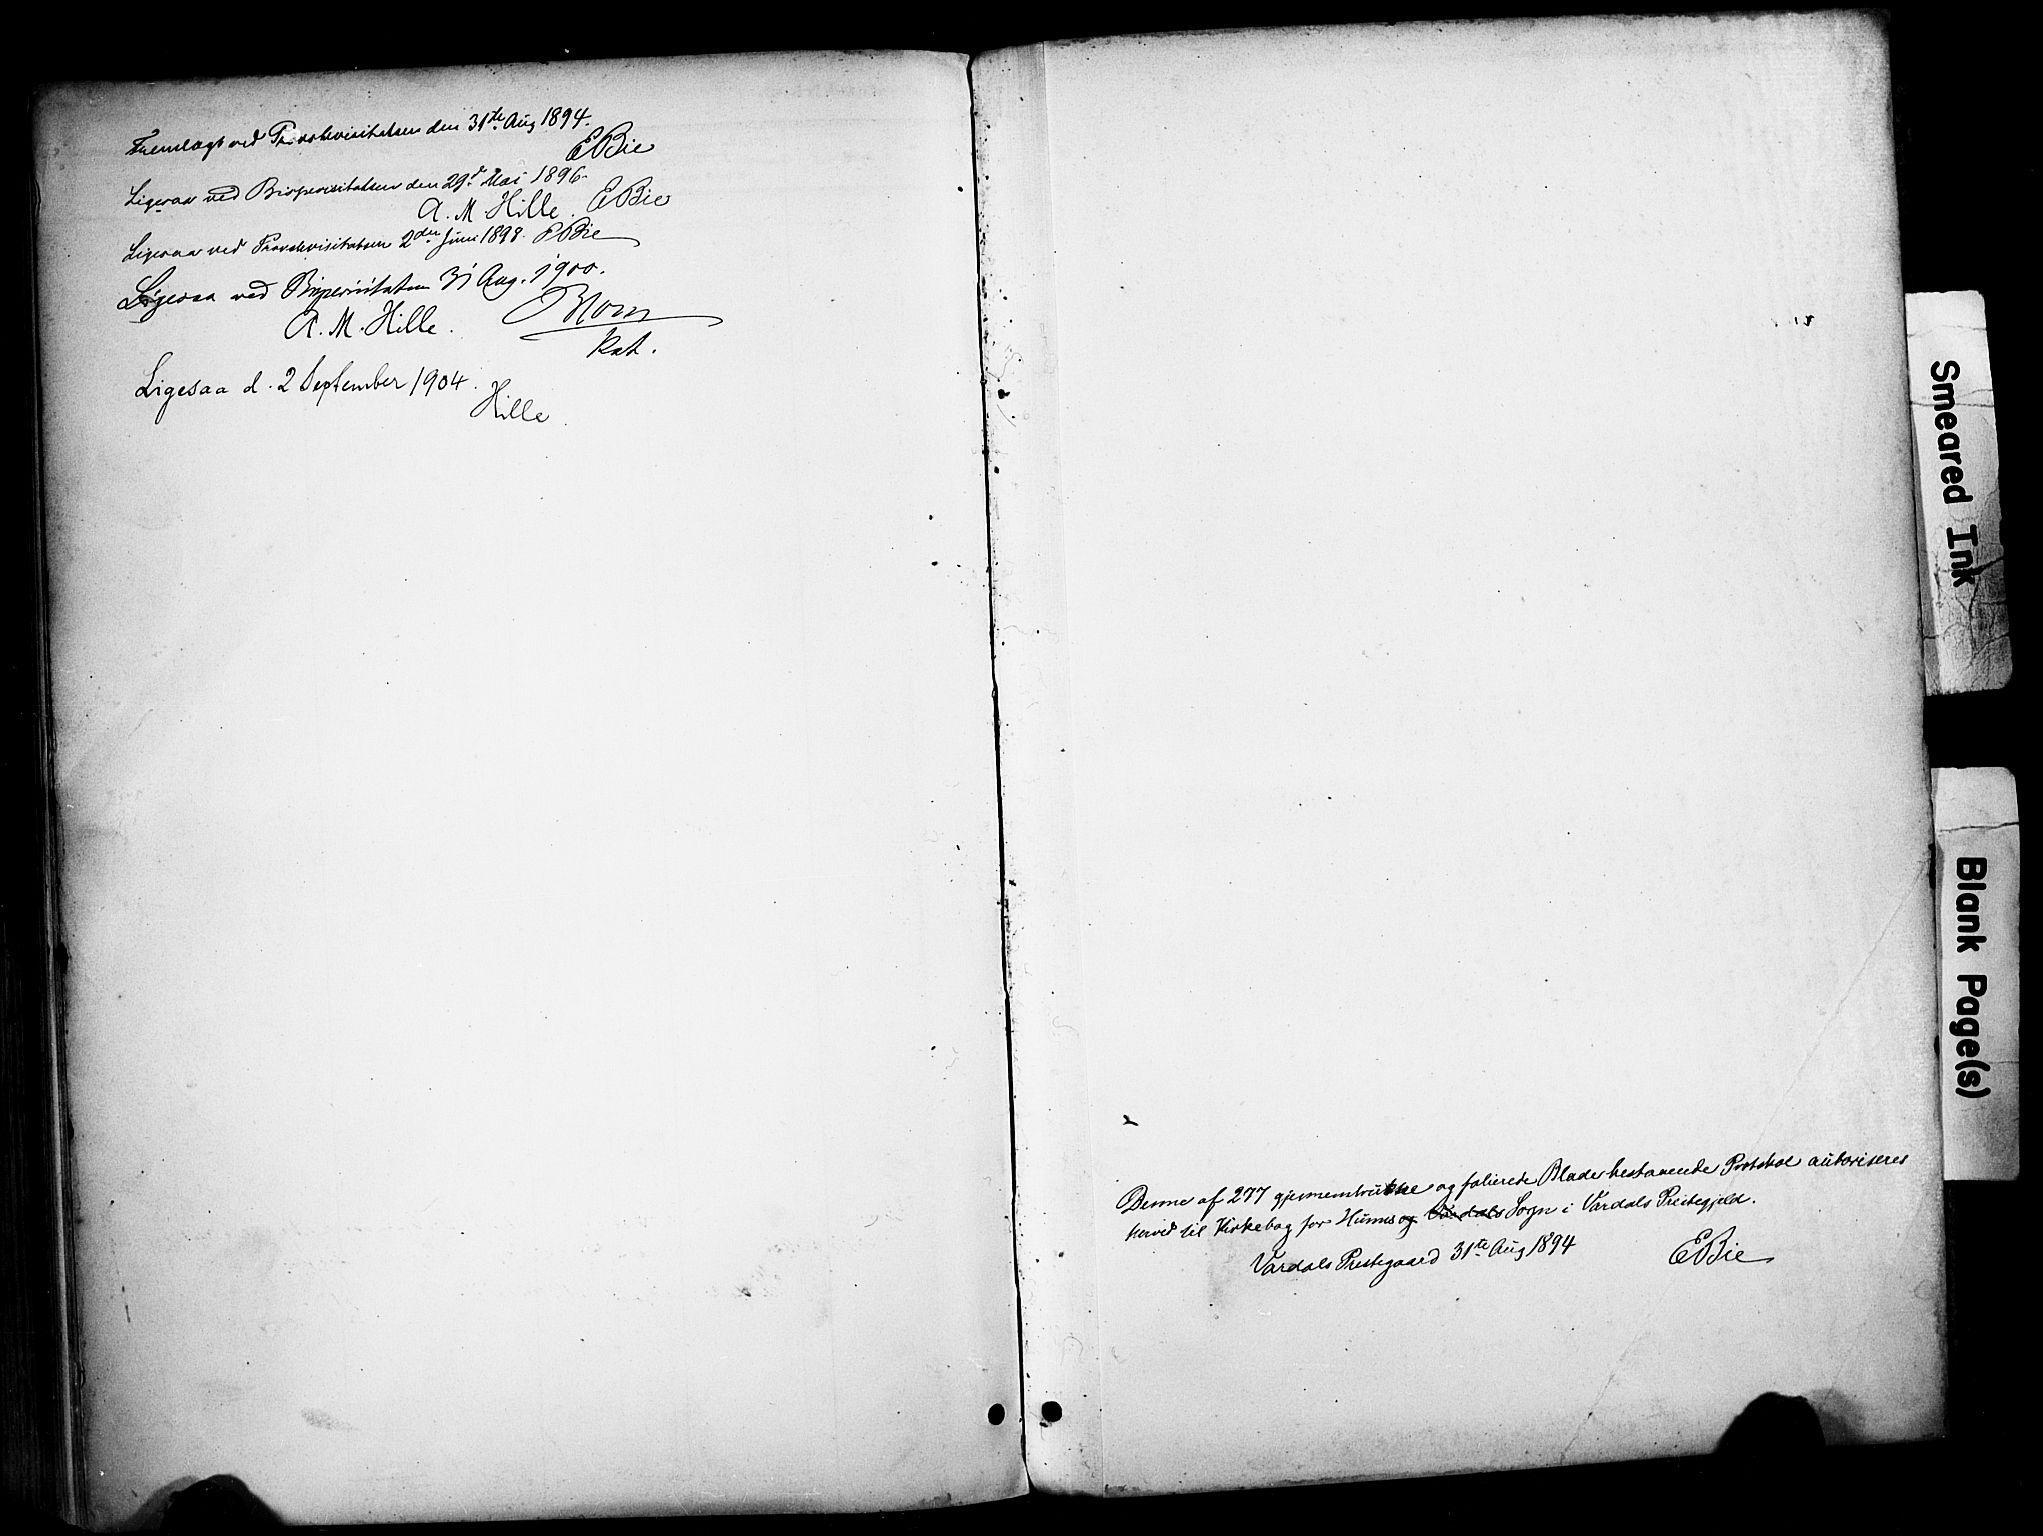 SAH, Vardal prestekontor, H/Ha/Haa/L0012: Ministerialbok nr. 12, 1893-1904, s. 270